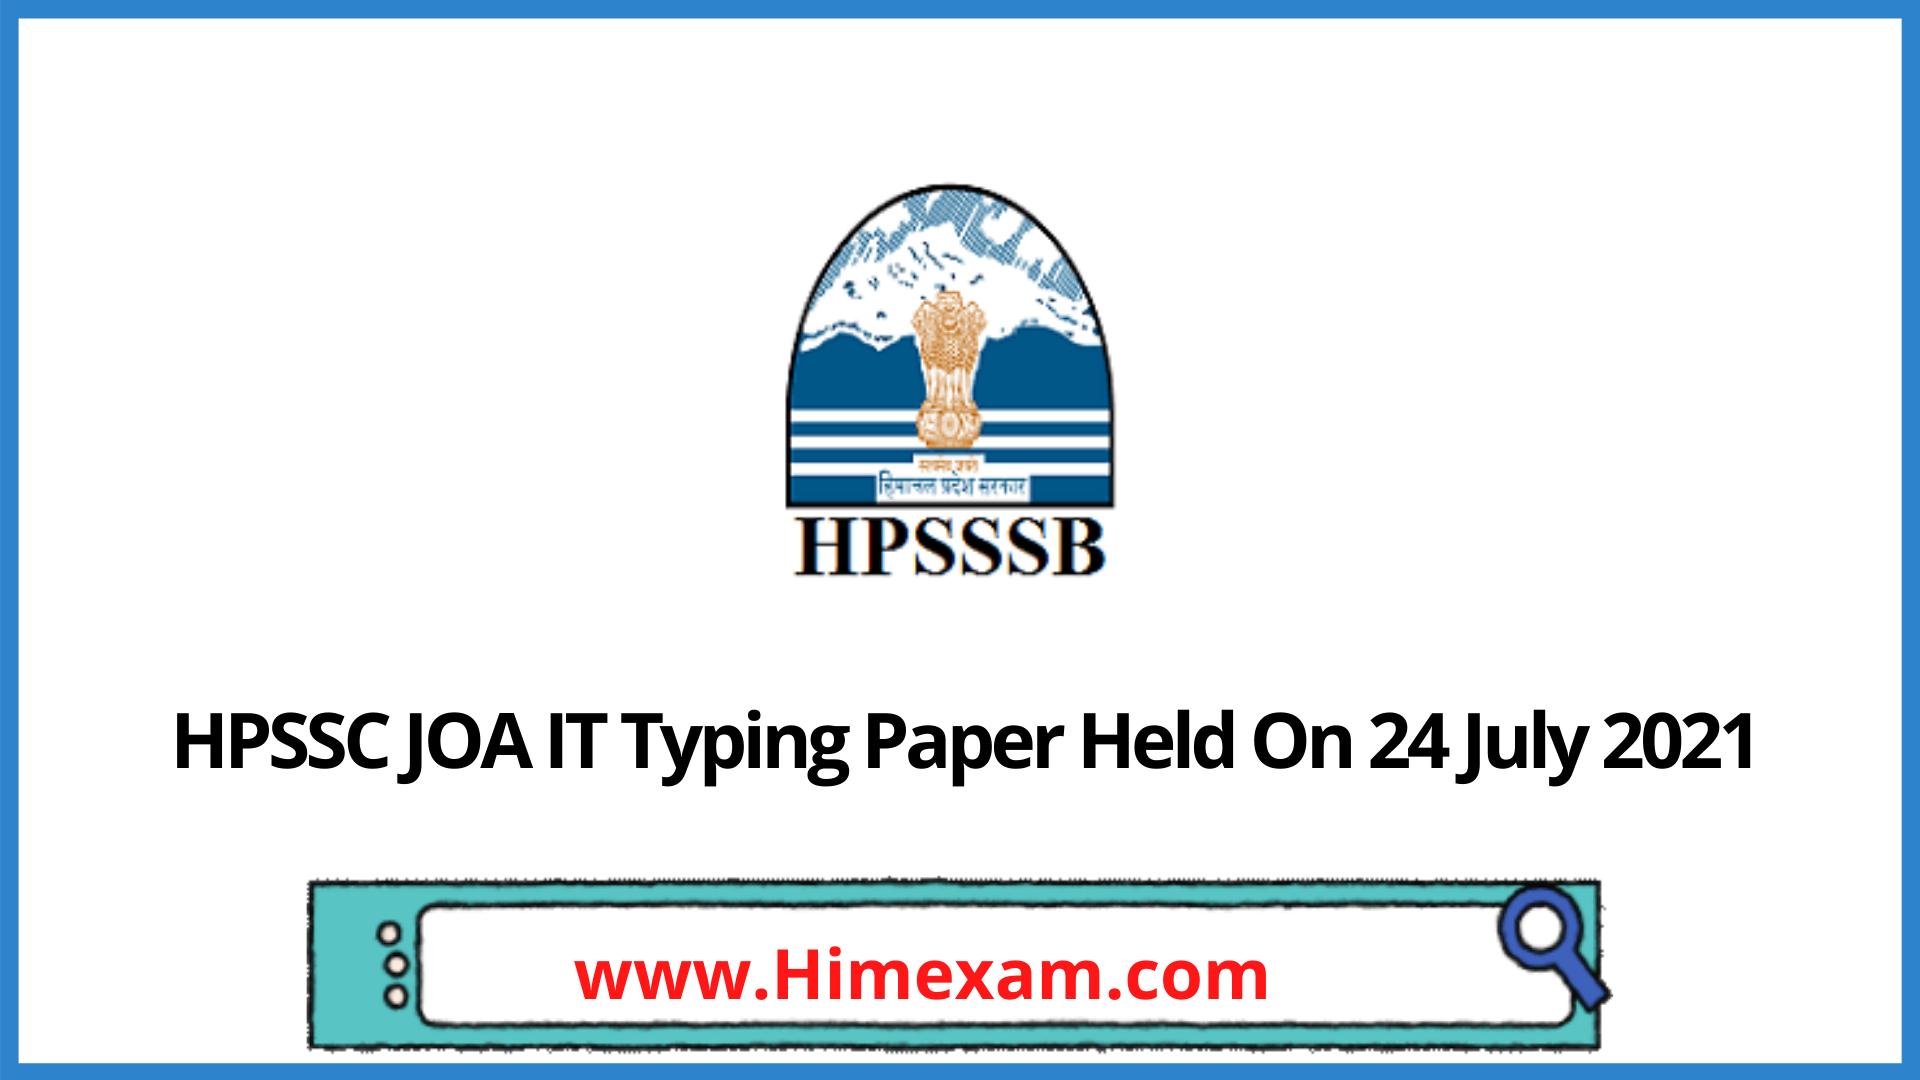 HPSSC JOA IT Typing Paper Held On 24 July 2021